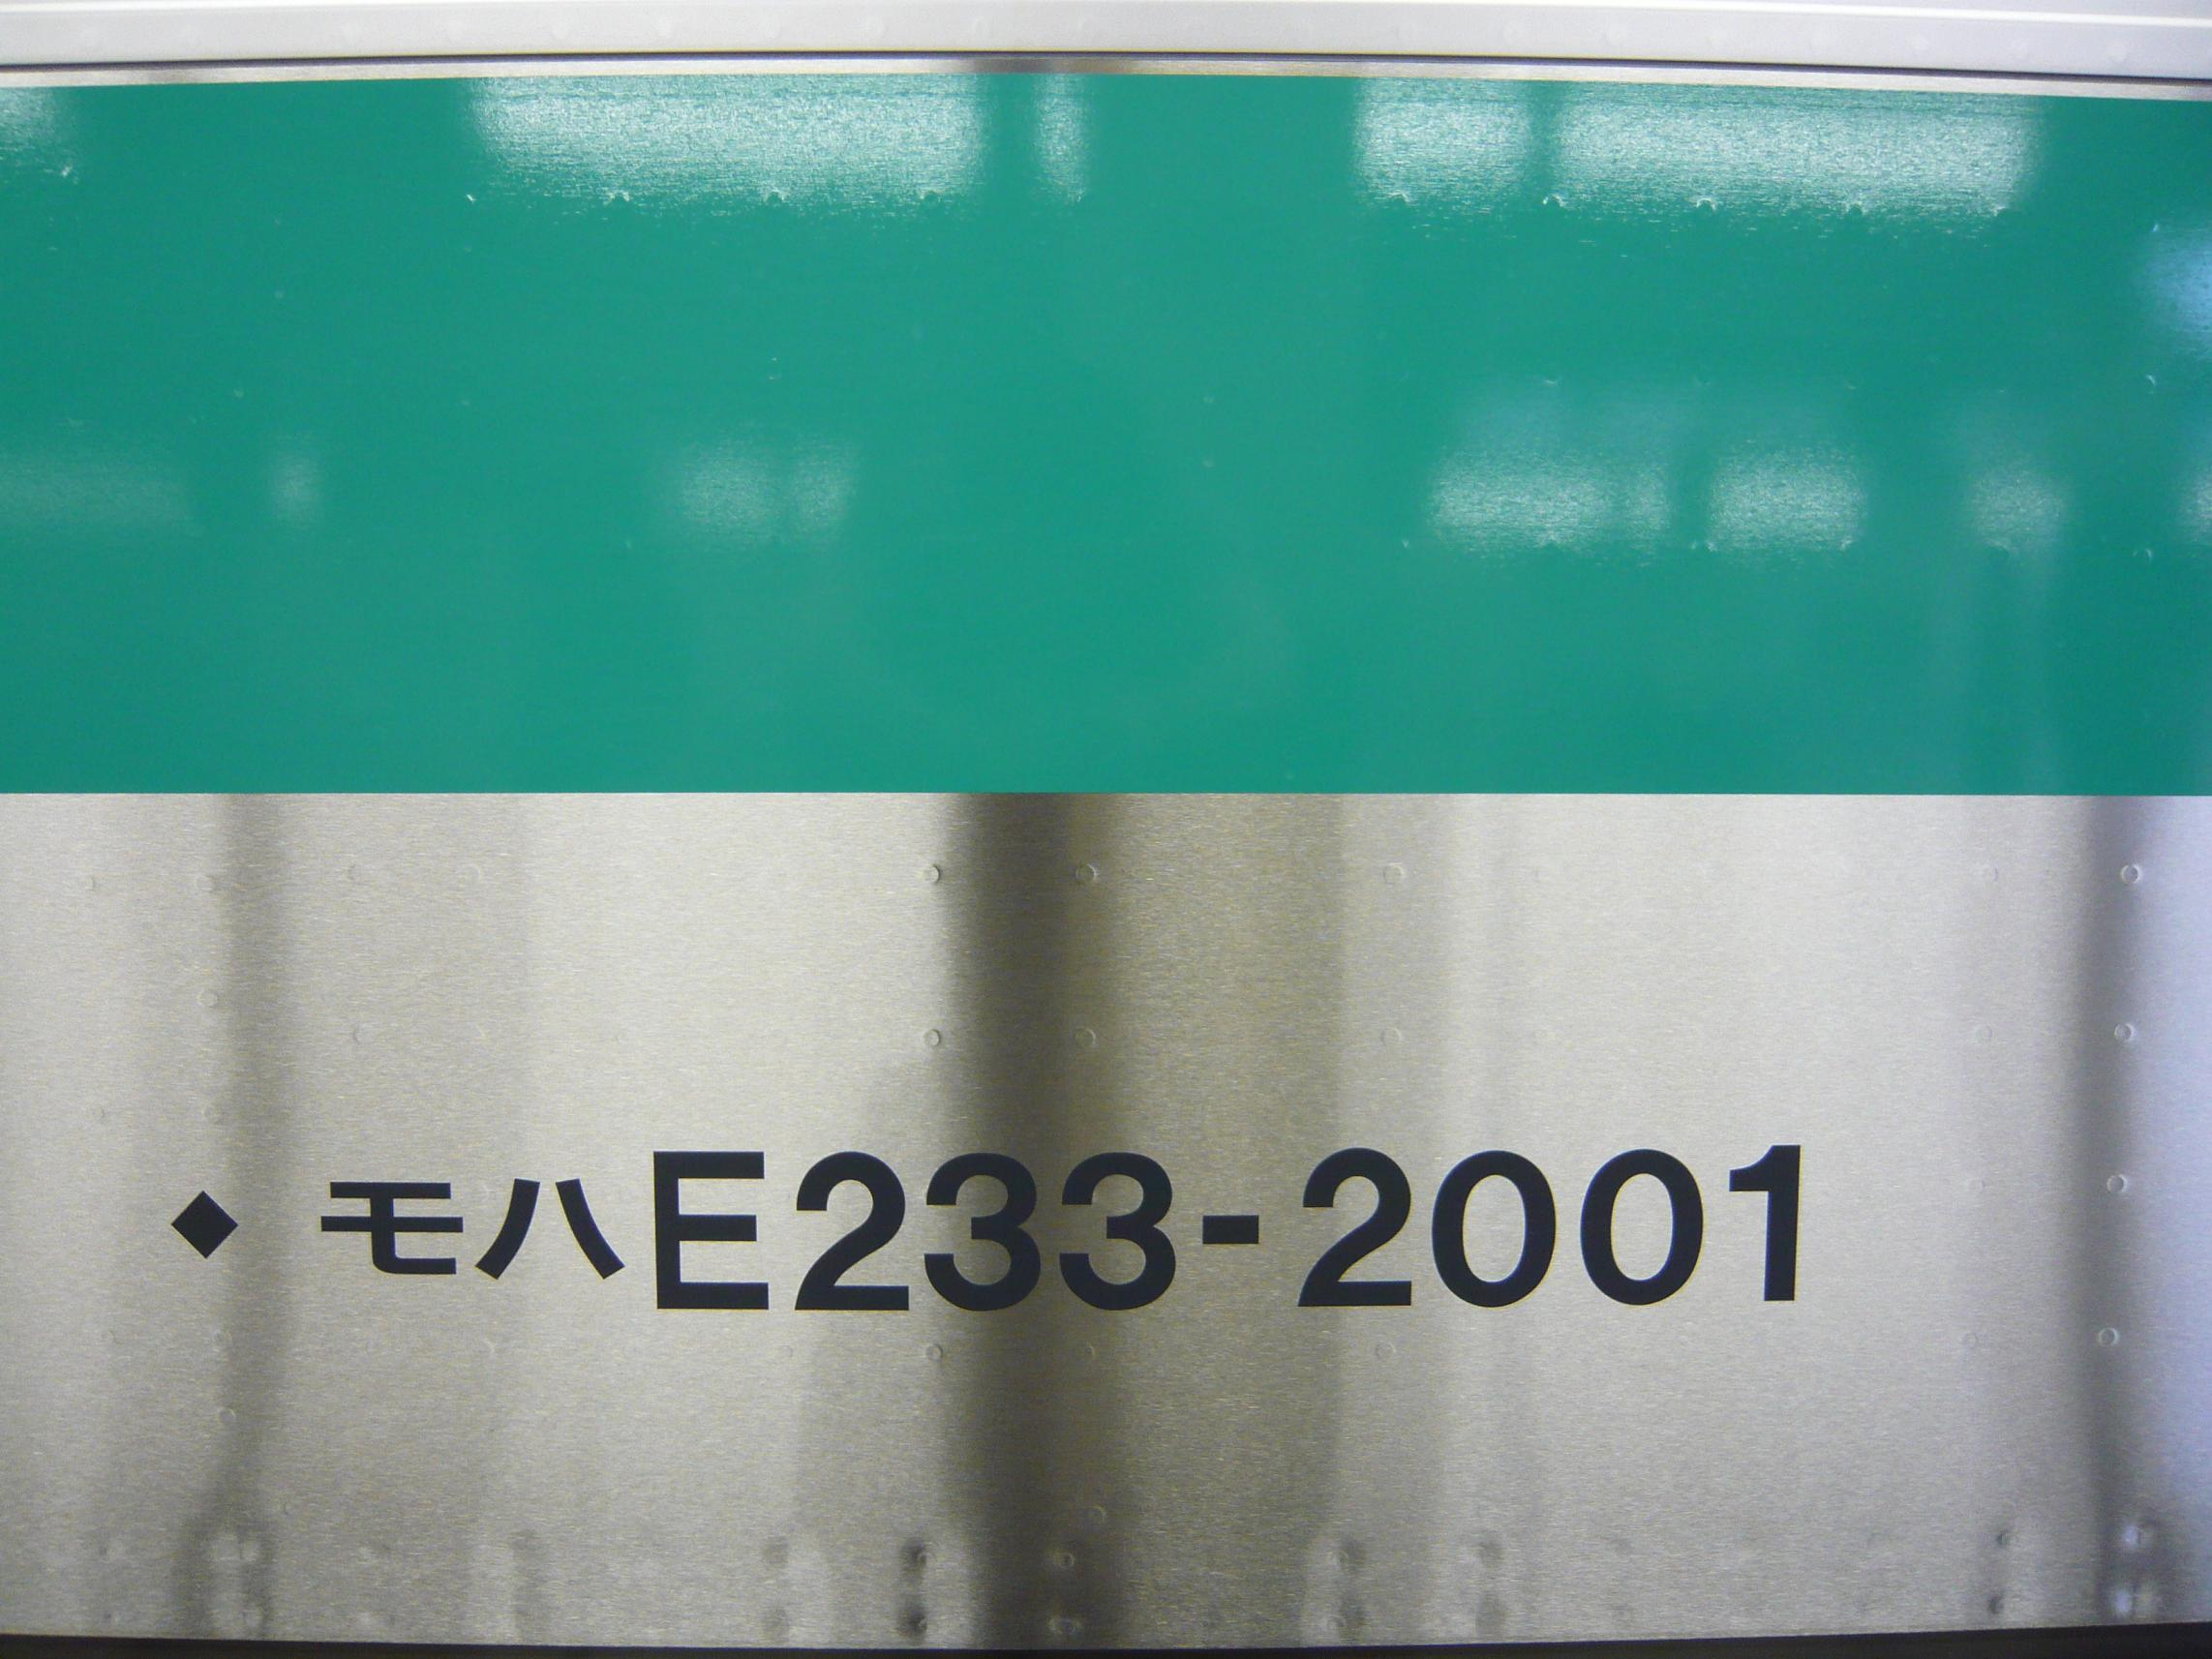 P1010718-2.JPG